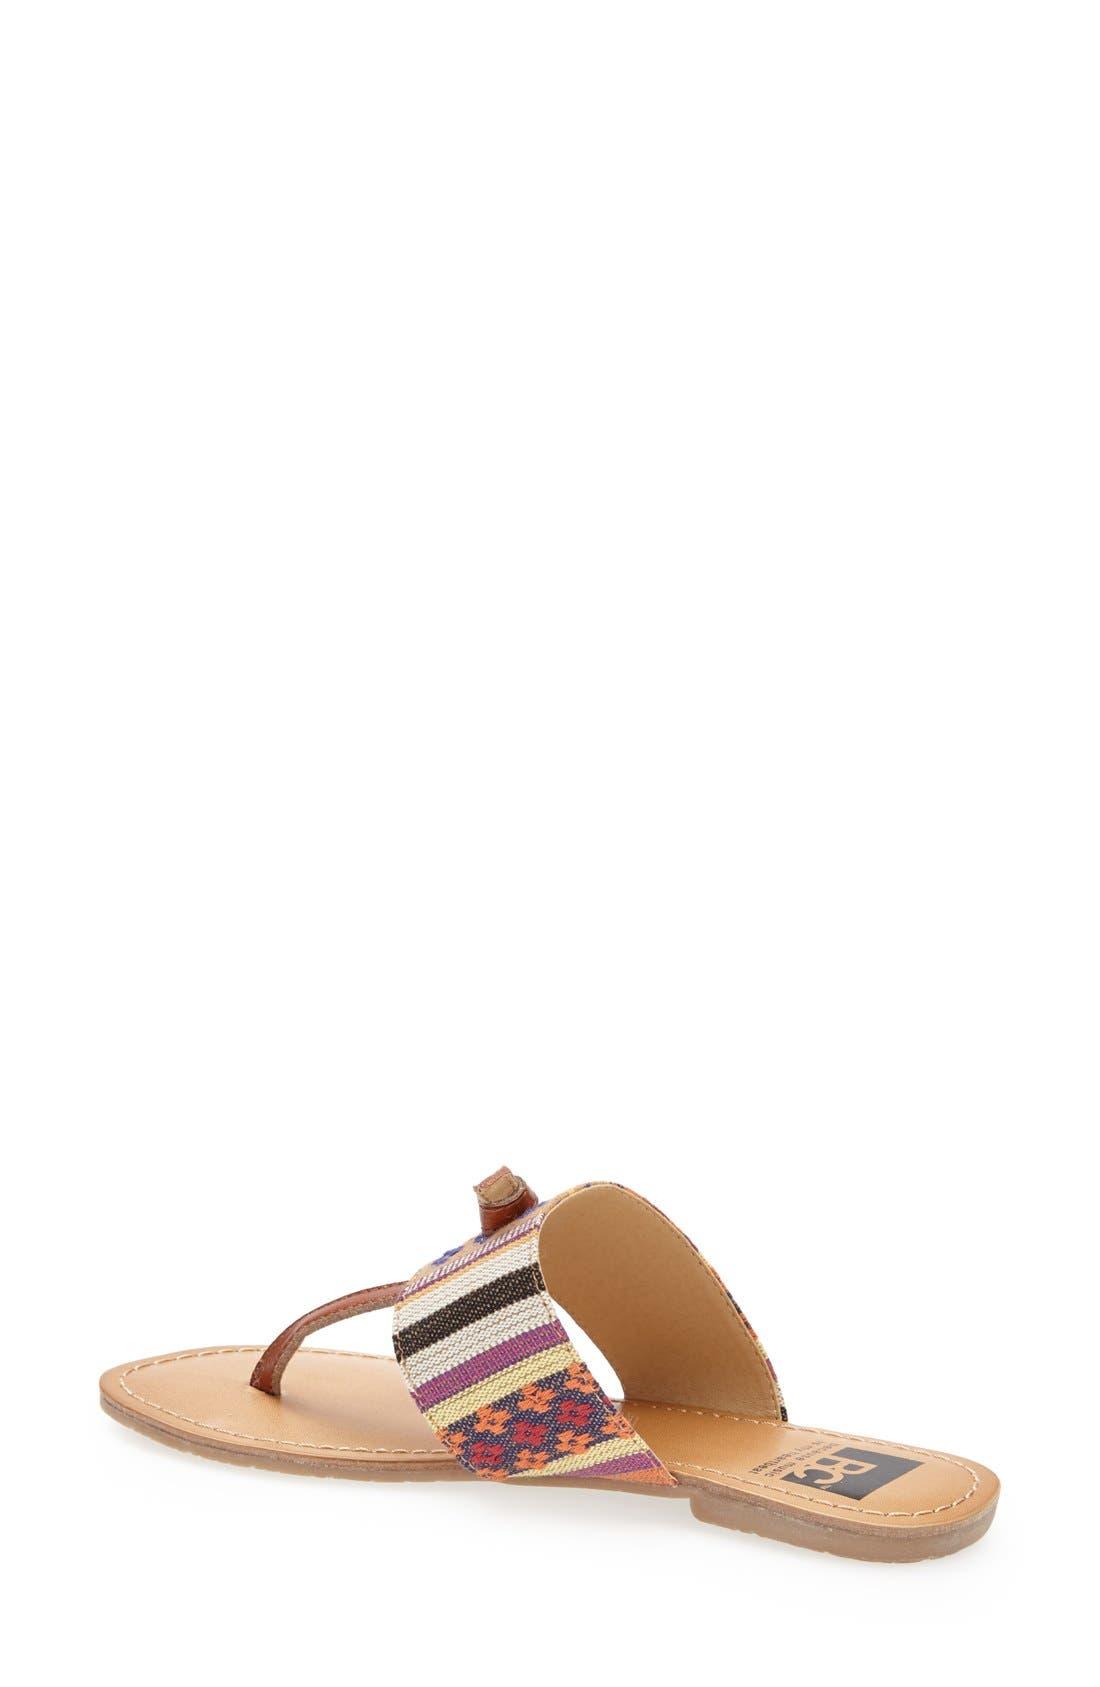 Alternate Image 2  - BC Footwear 'Gotta Try' Thong Sandal (Women)